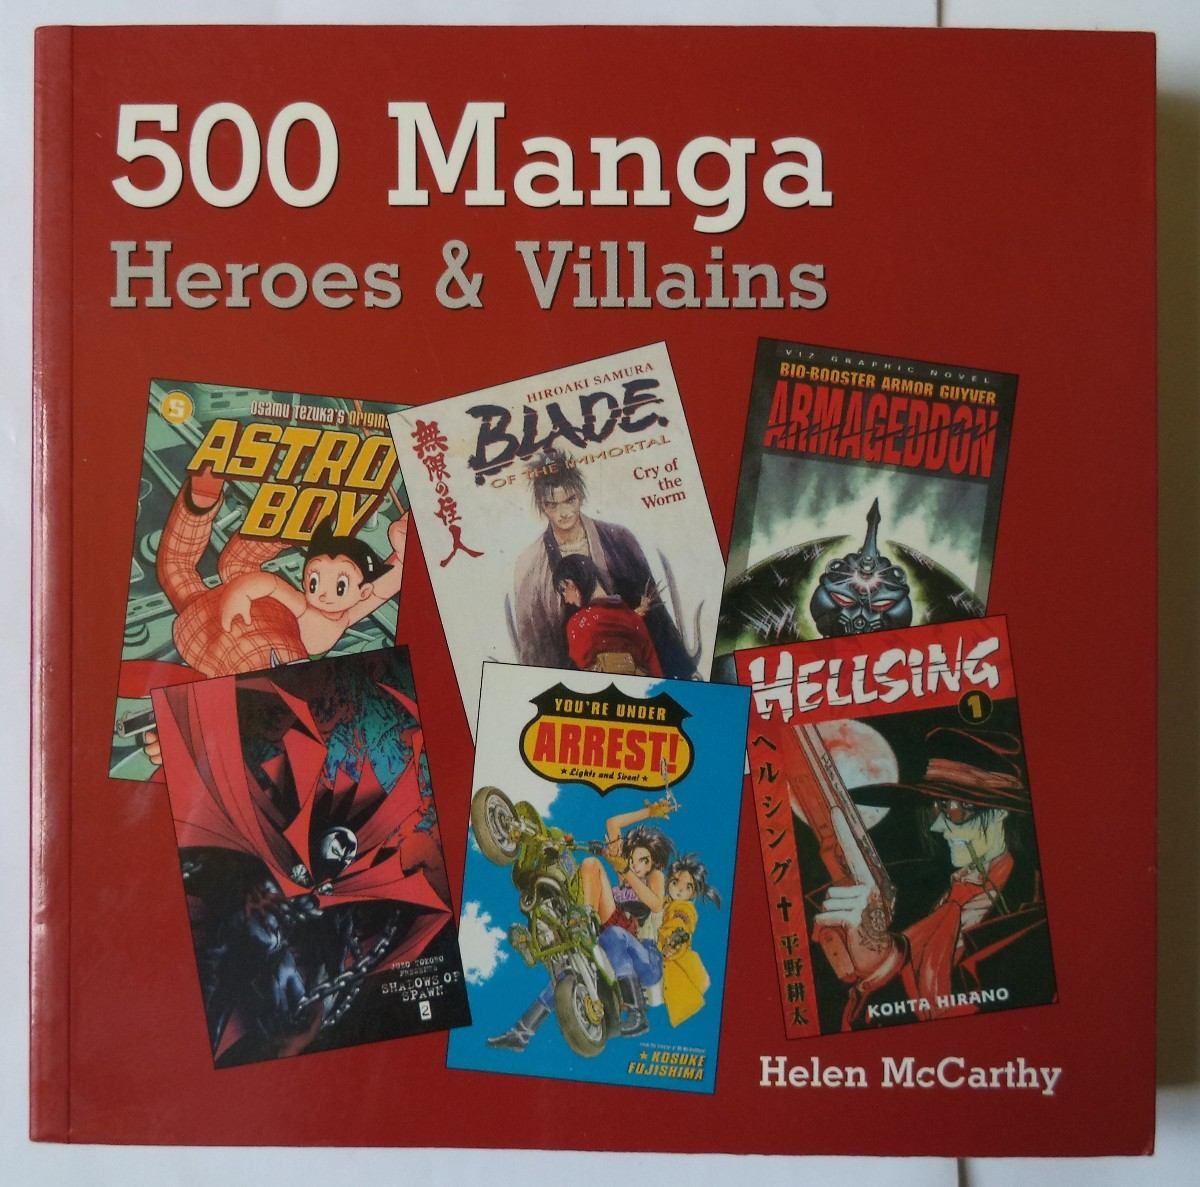 500 MANGA HEROES AND VILLAINS PDF